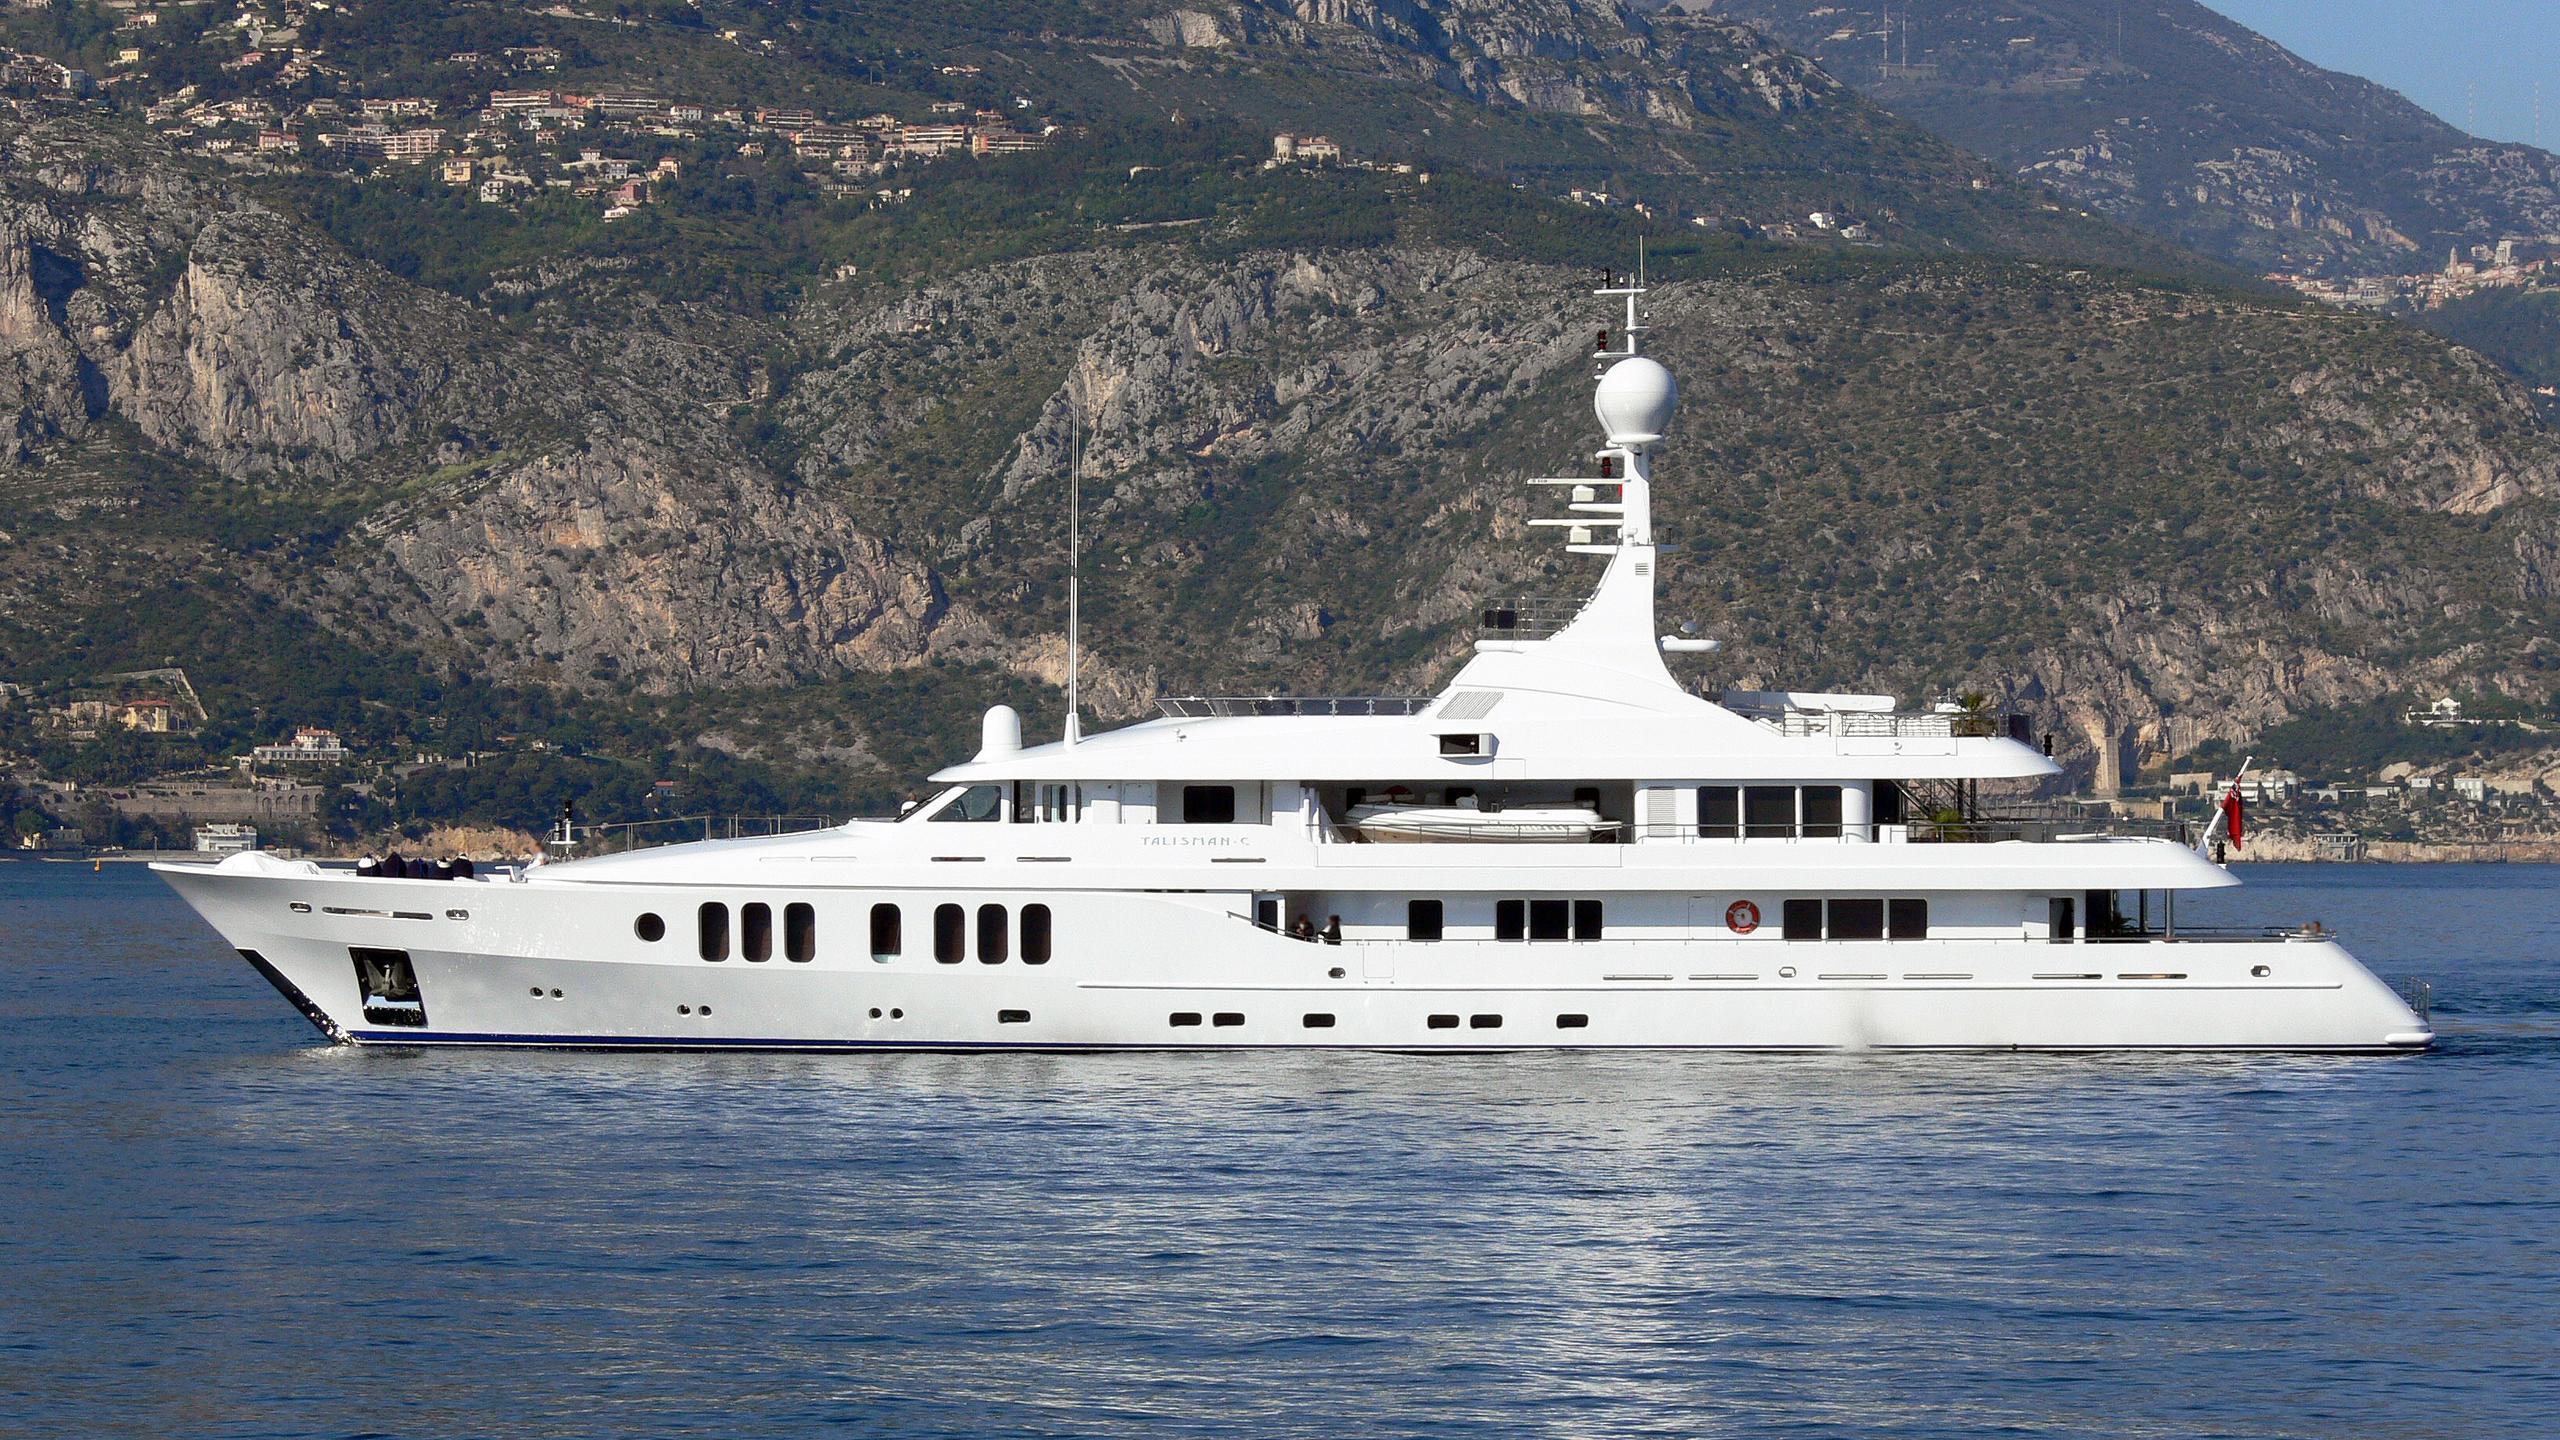 talisman-maiton-motor-yacht-turquoise-2006-54m-profile